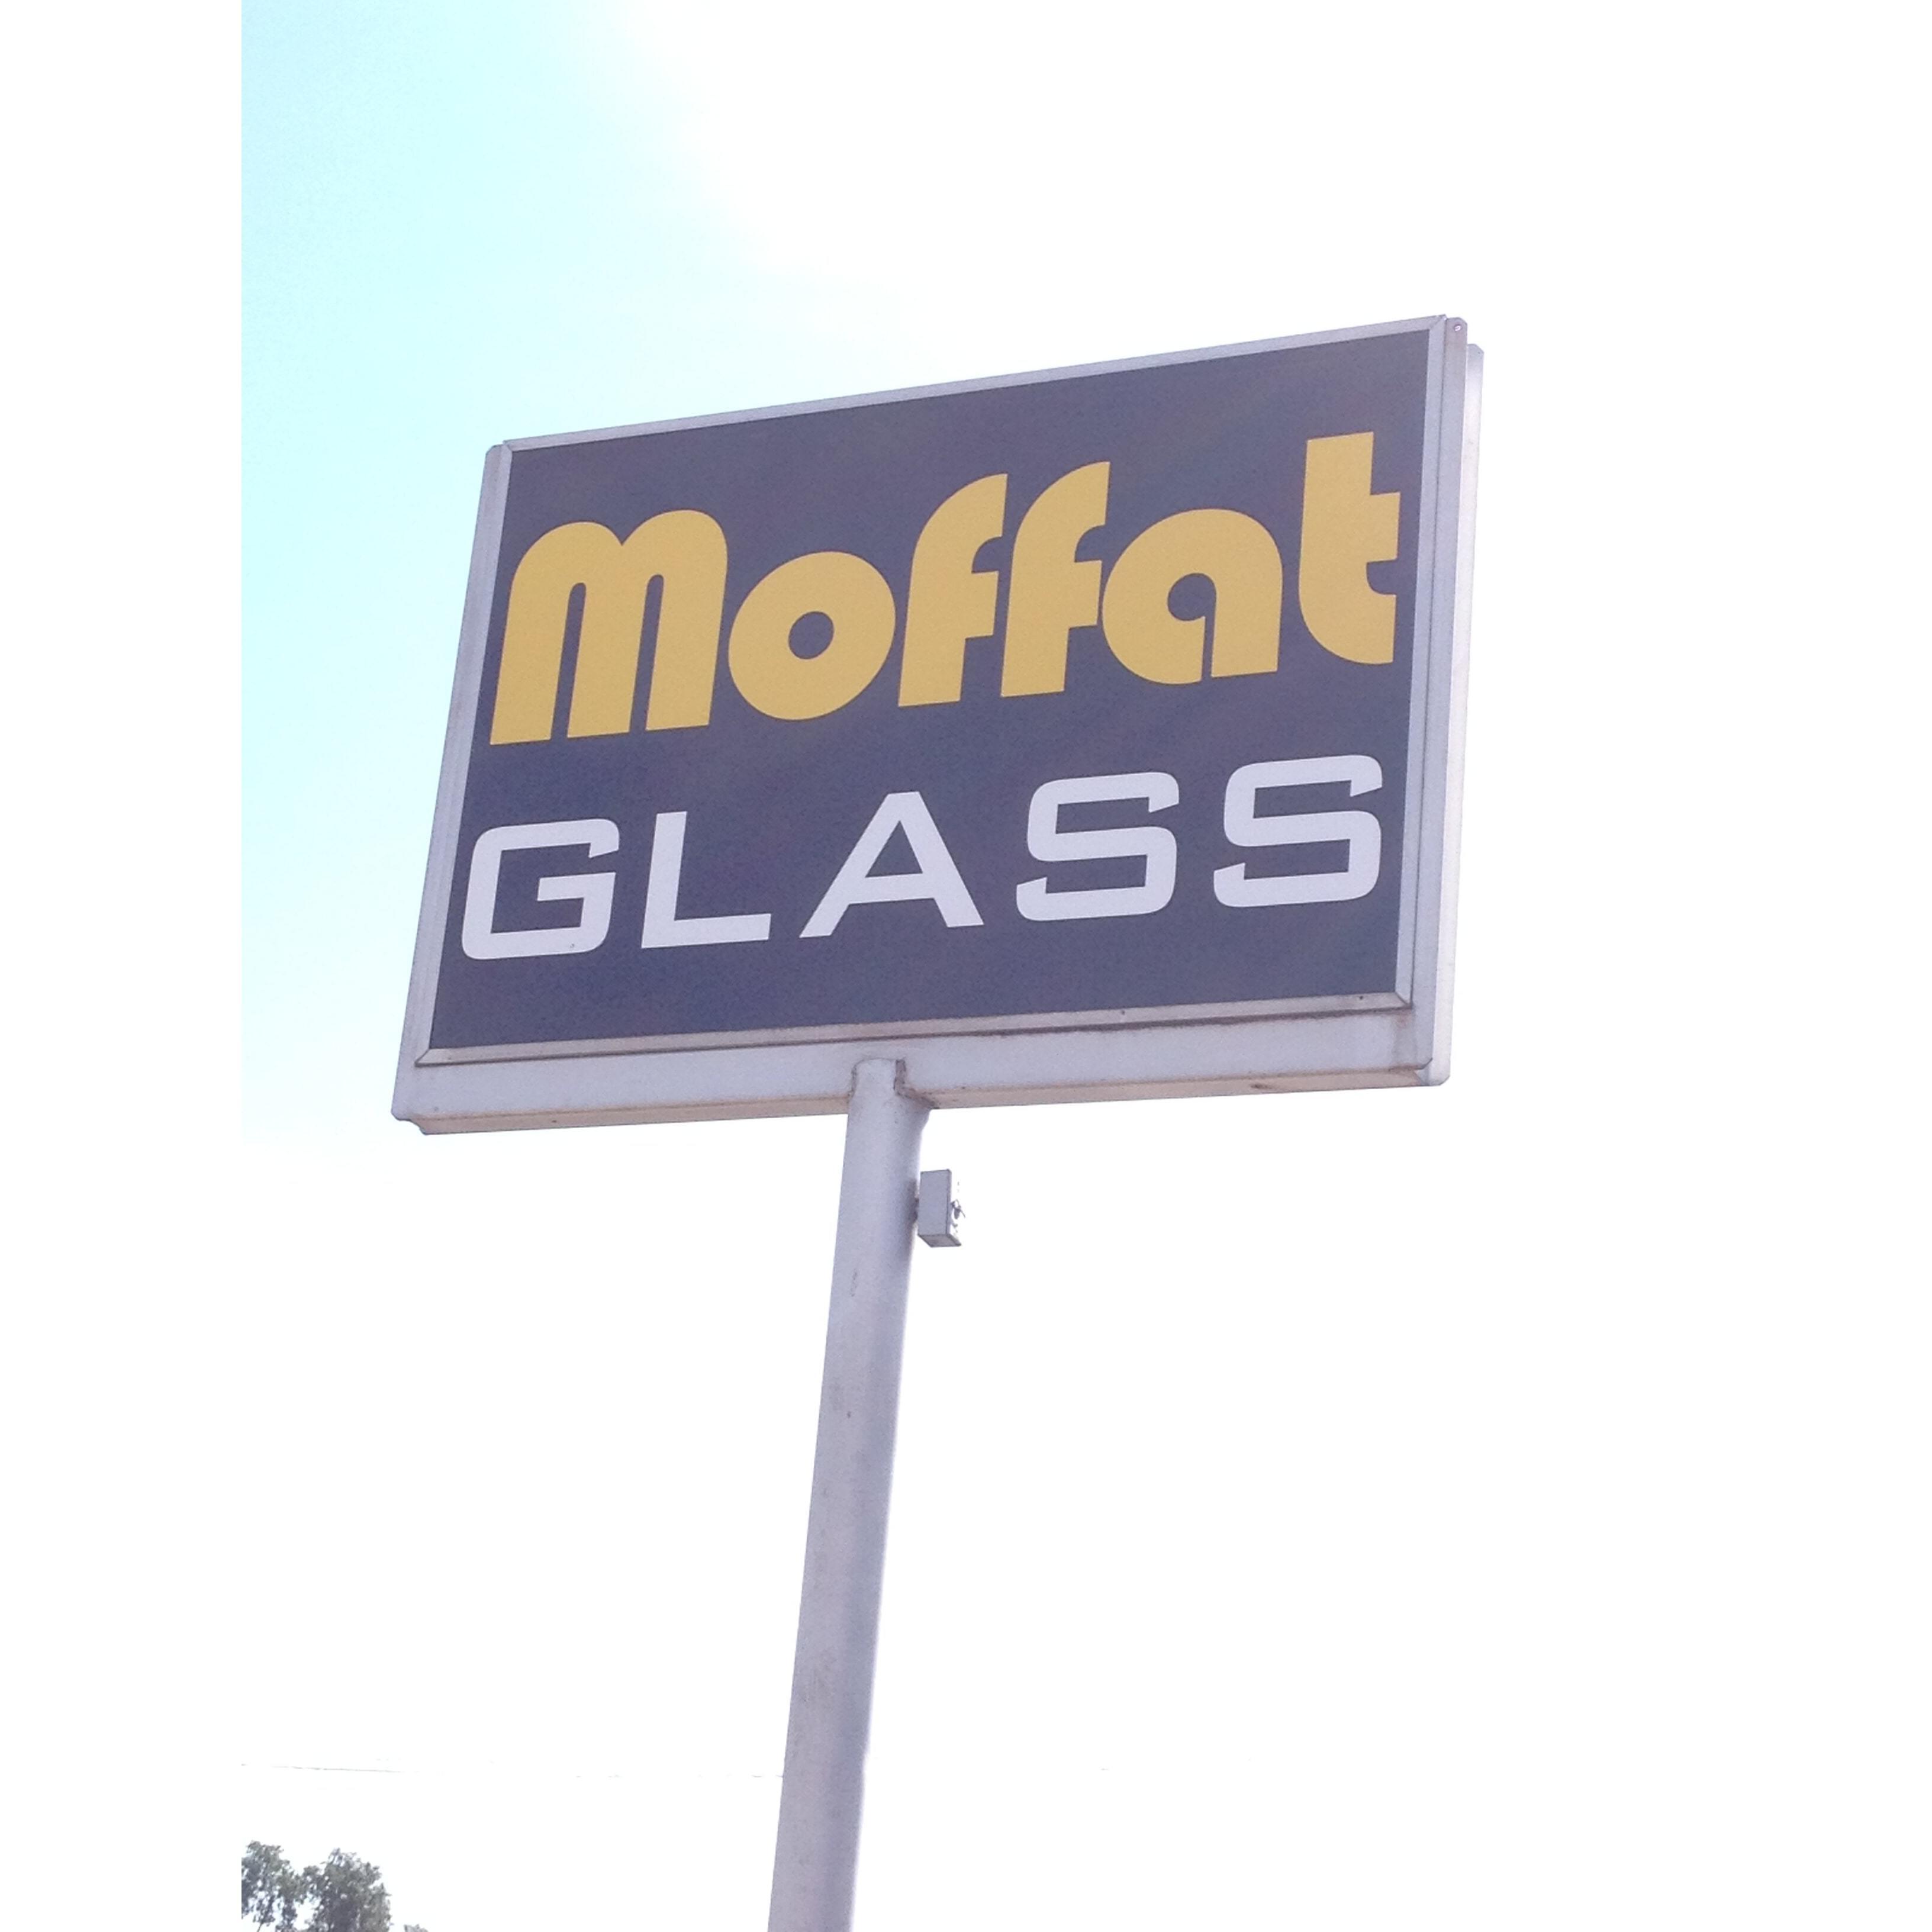 Moffat Paint & Glass